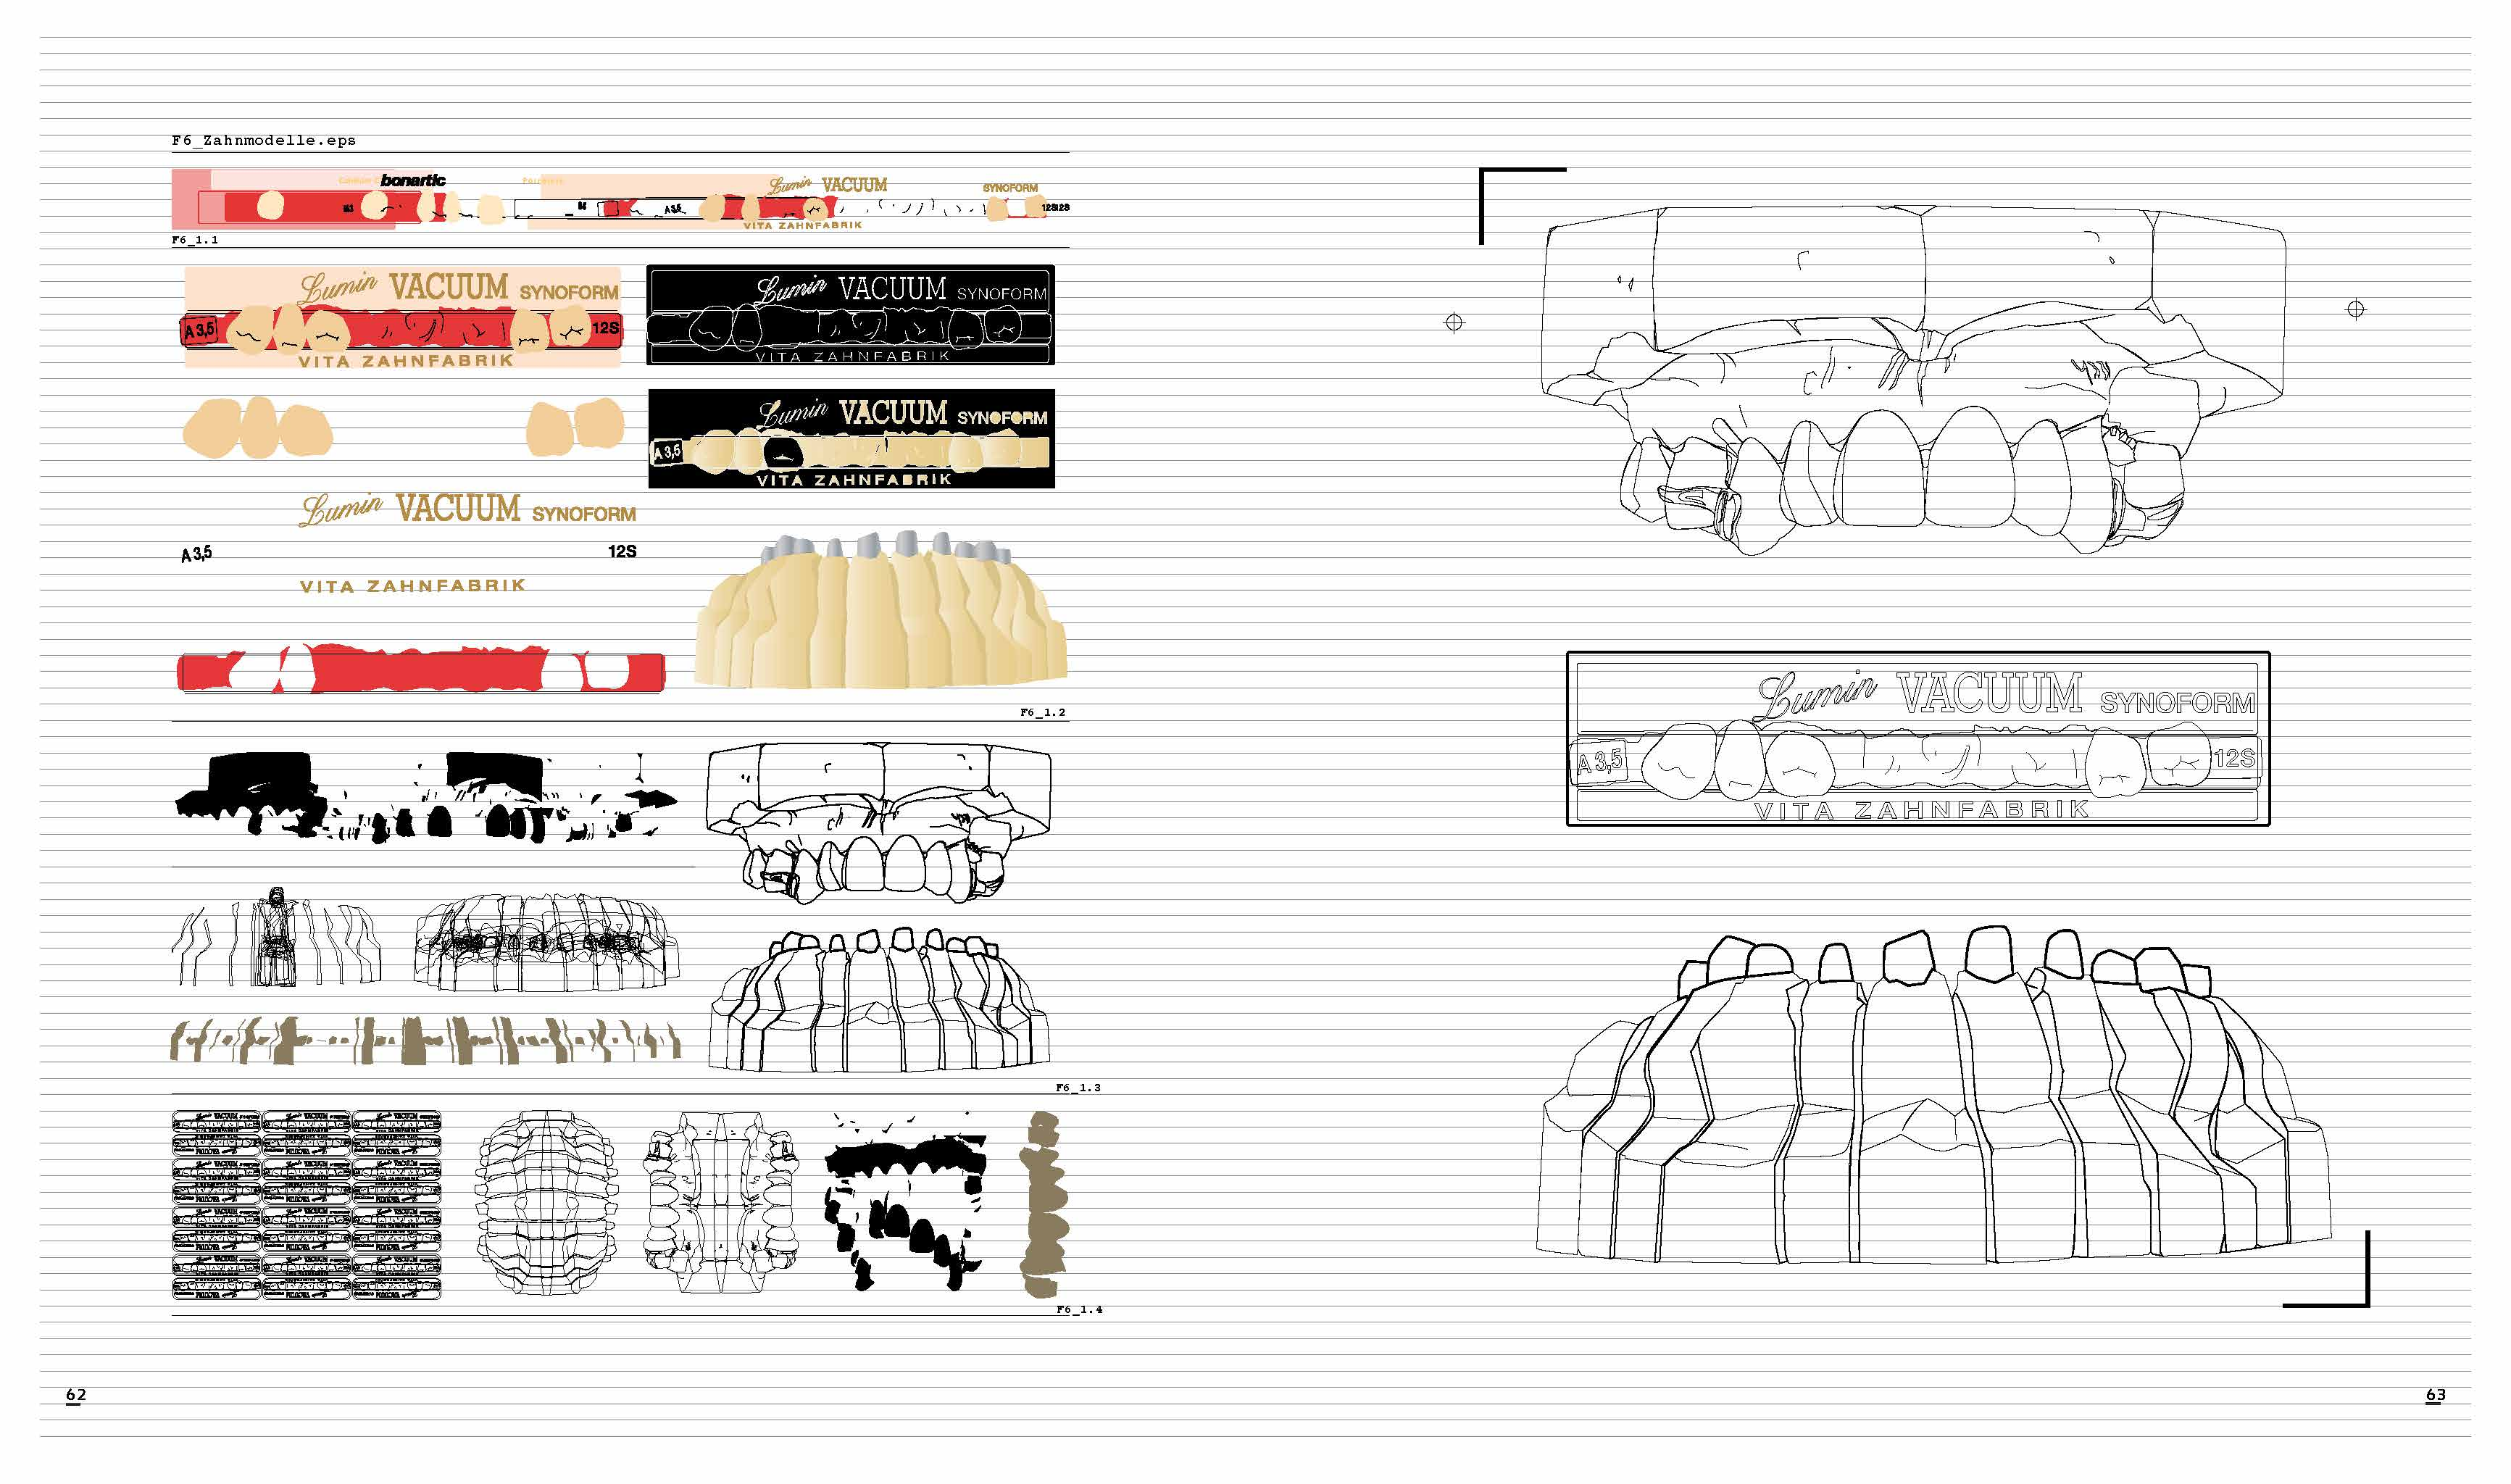 visual_recycling_druckboegen_Seite_032